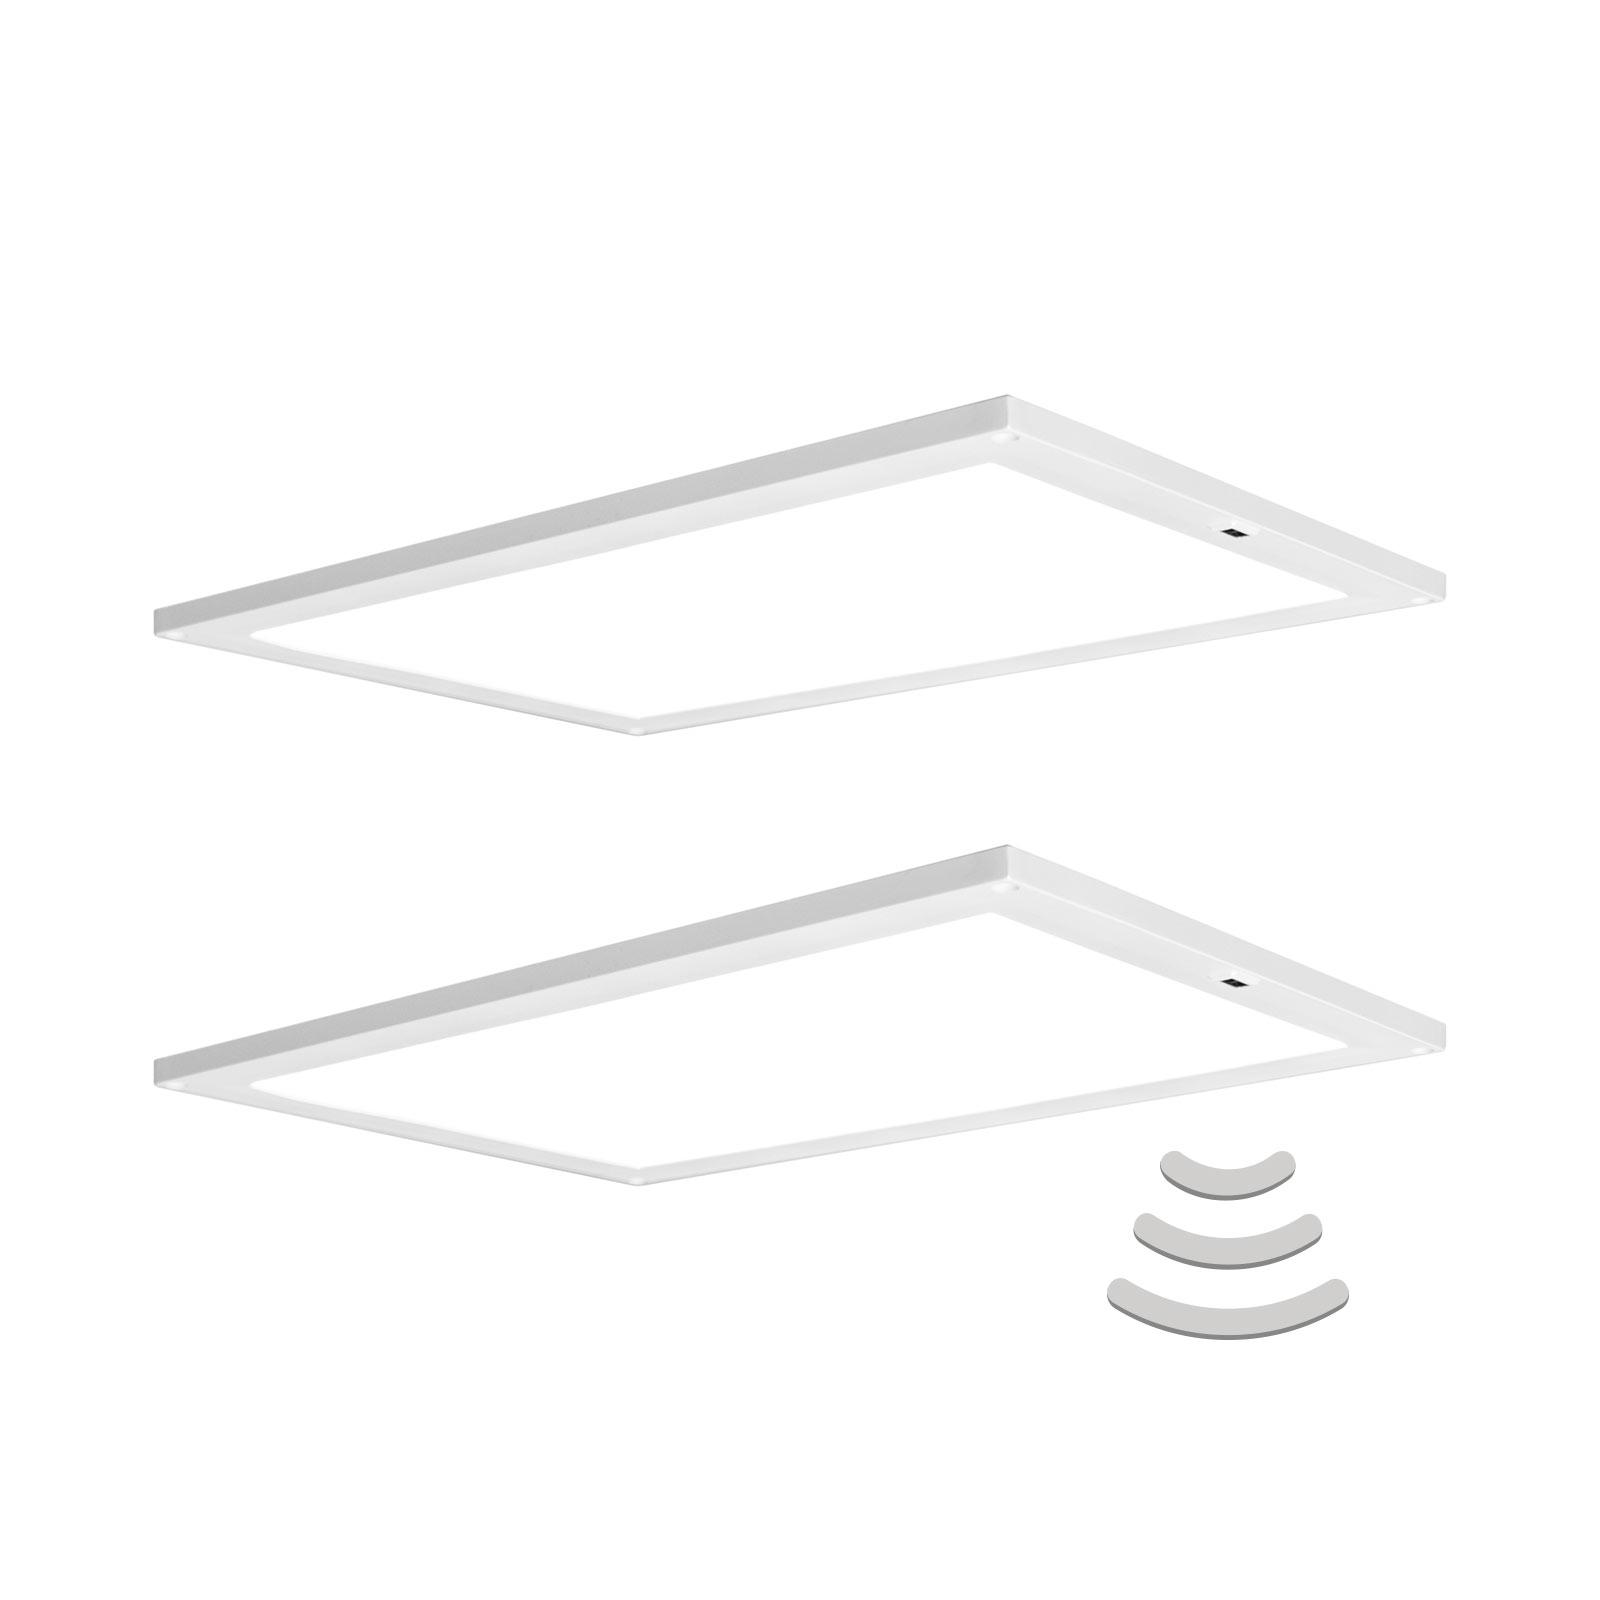 LEDVANCE Cabinet Panel Unterbaulampe 30x20cm 2er